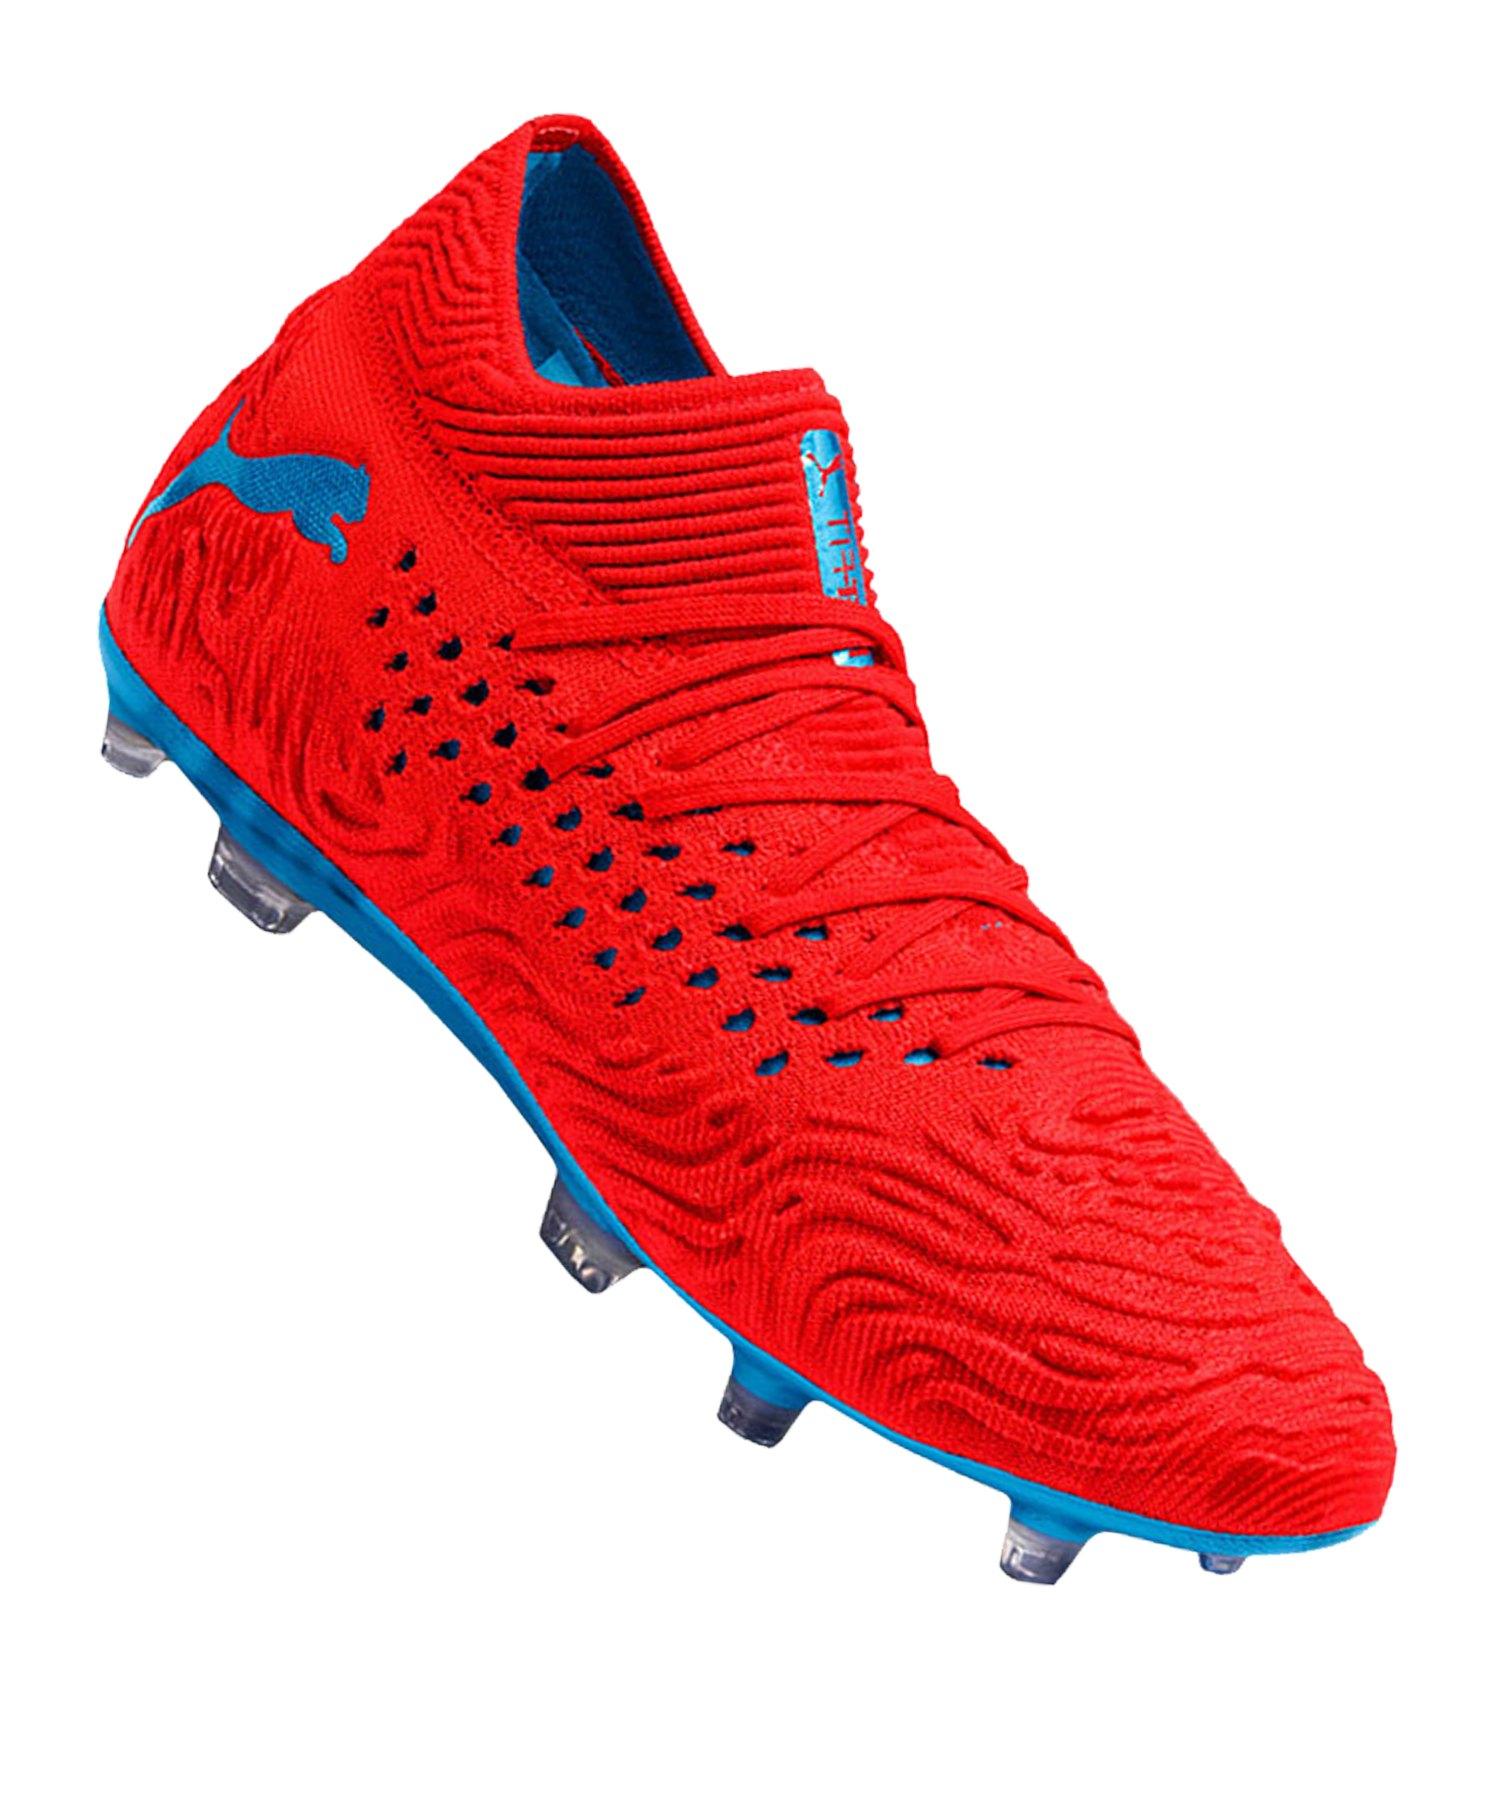 2c88a4995f PUMA FUTURE 19.1 NETFIT FG/AG Rot F01 |Fussballschuhe | Rasen | Ballgefühl  | Nocken | 10111021